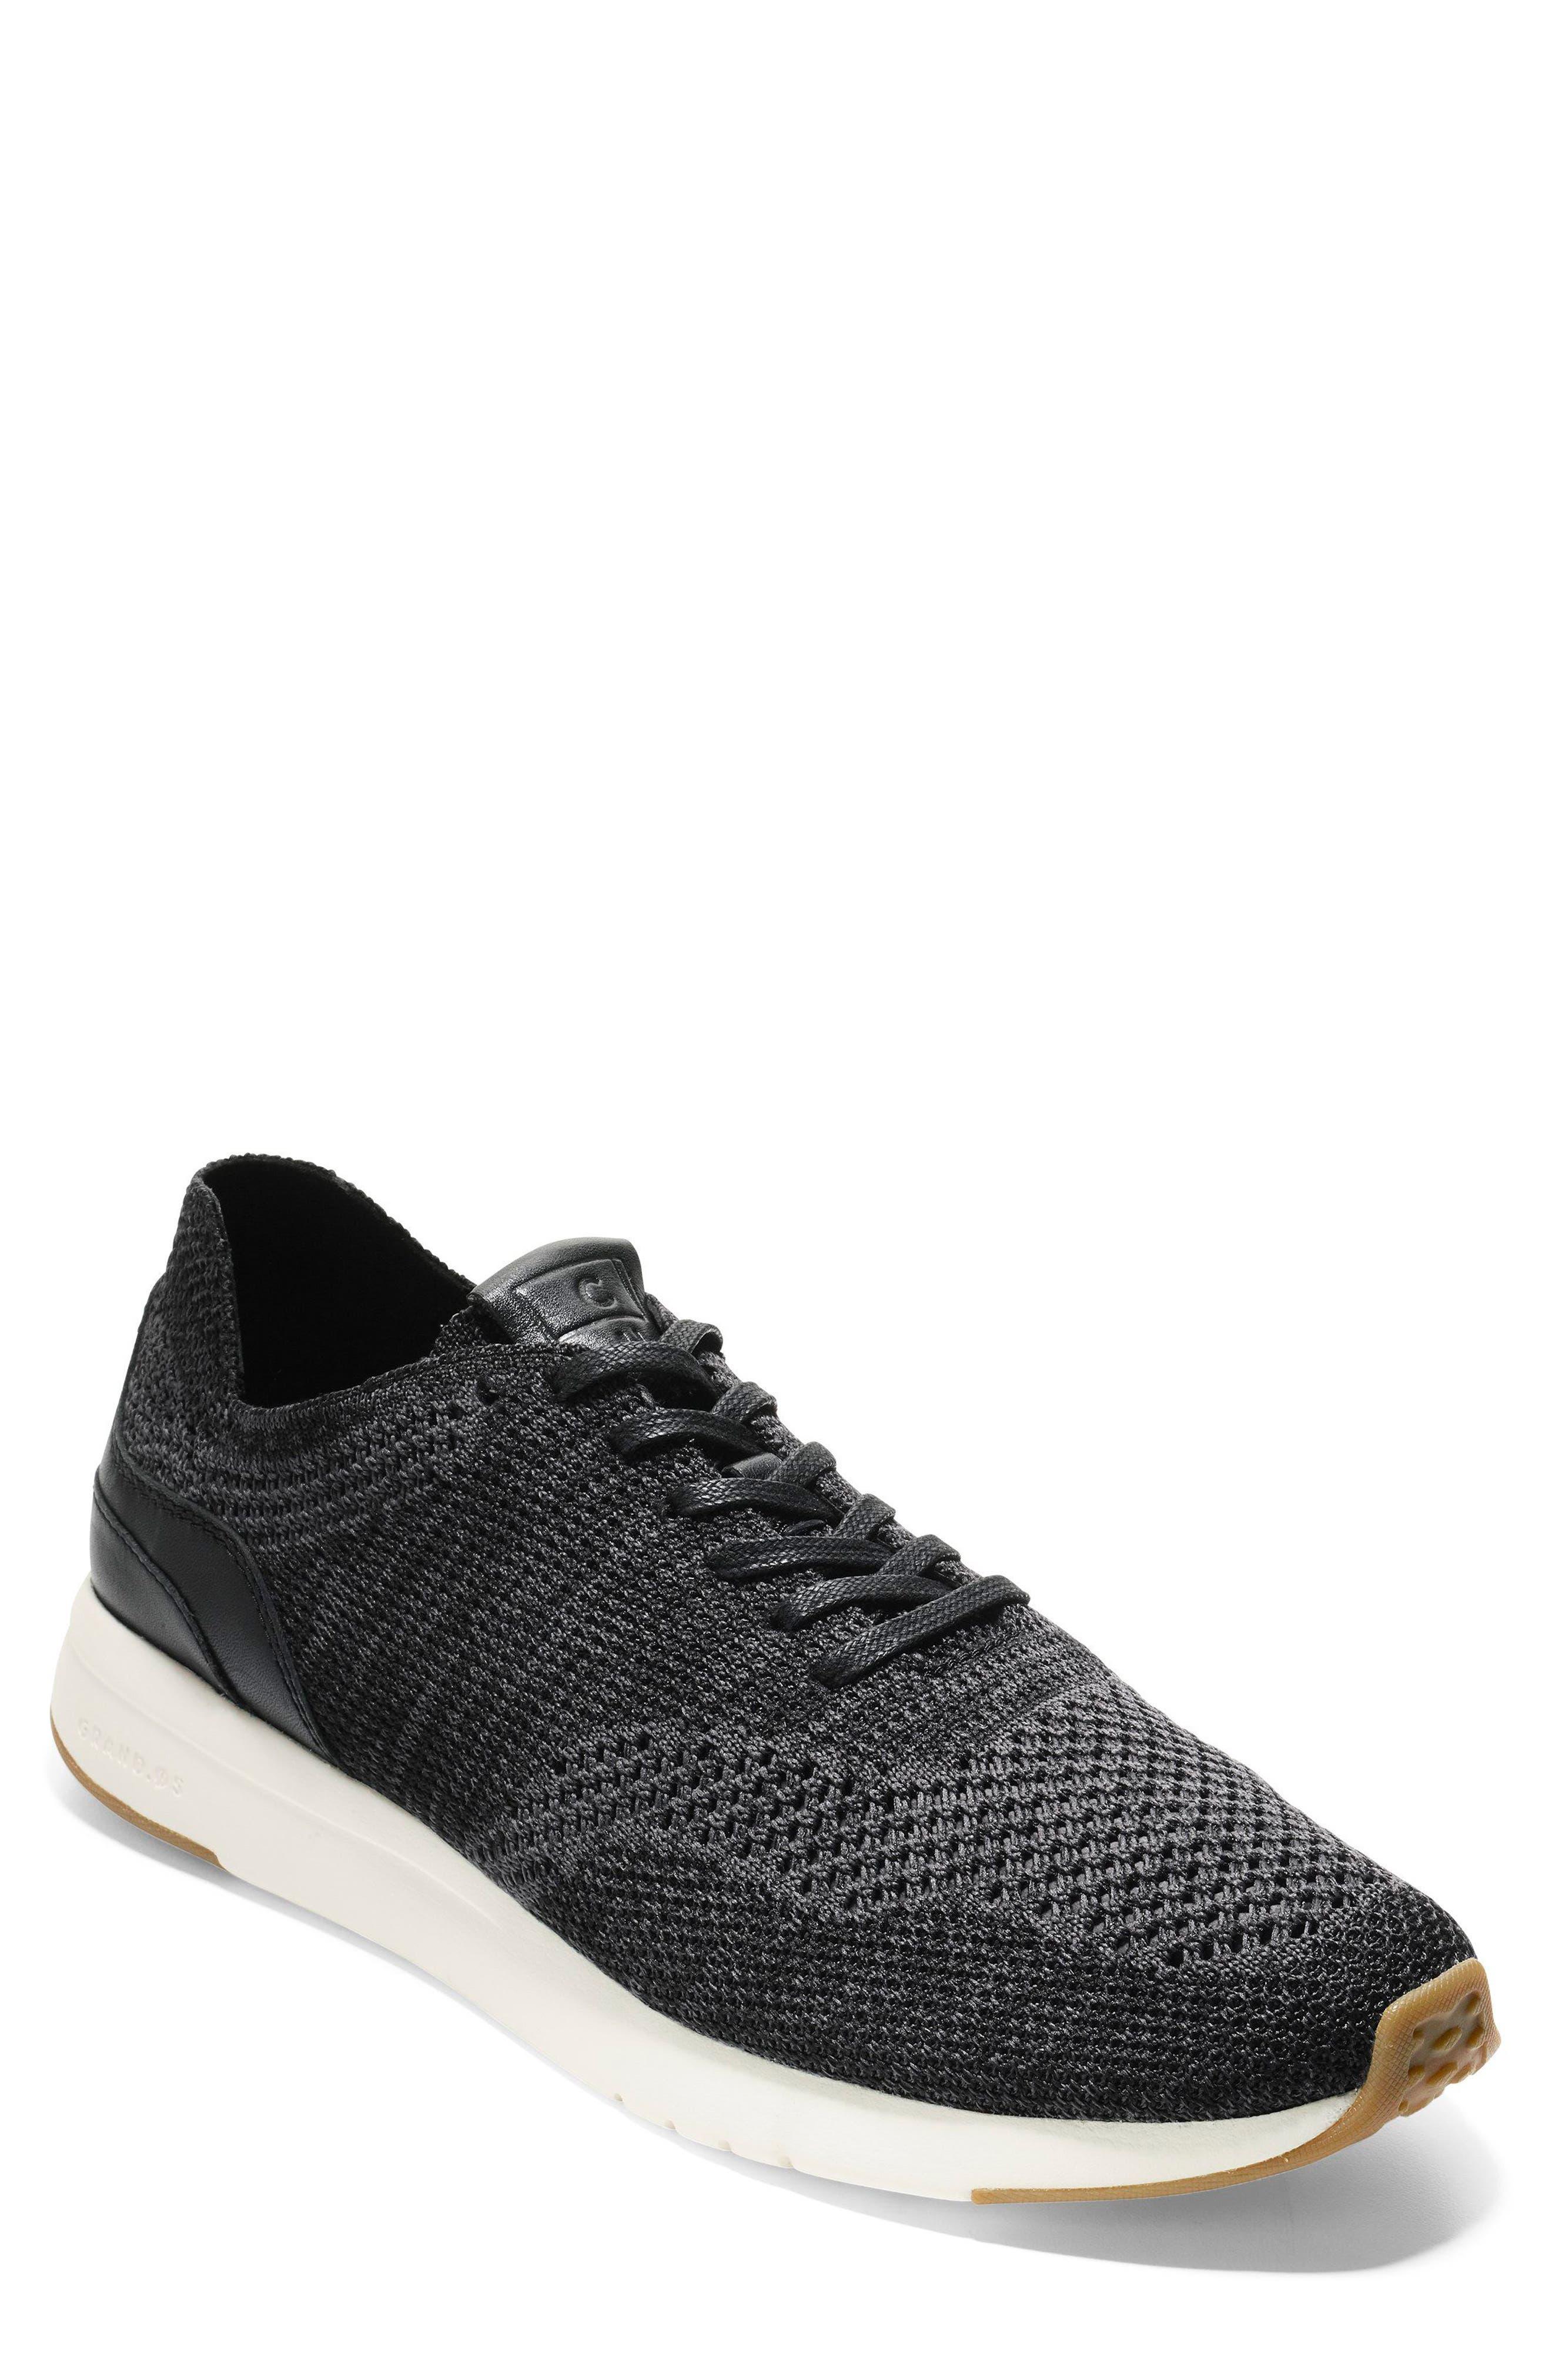 GrandPro Runner Stitchlite Sneaker,                             Main thumbnail 1, color,                             001